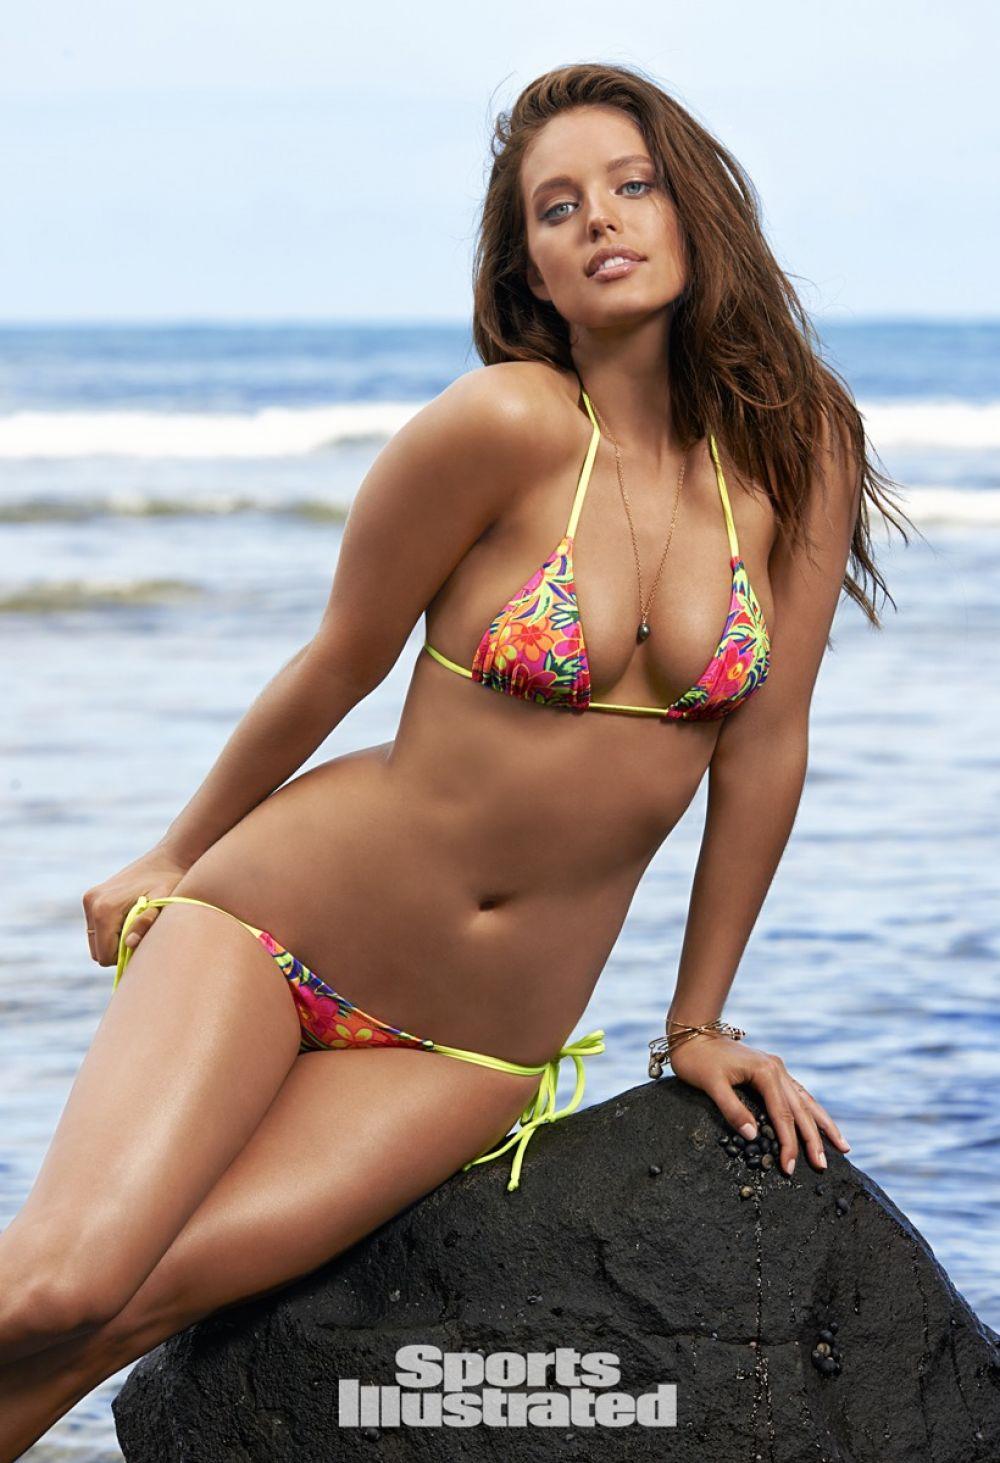 Sport bikini athletic